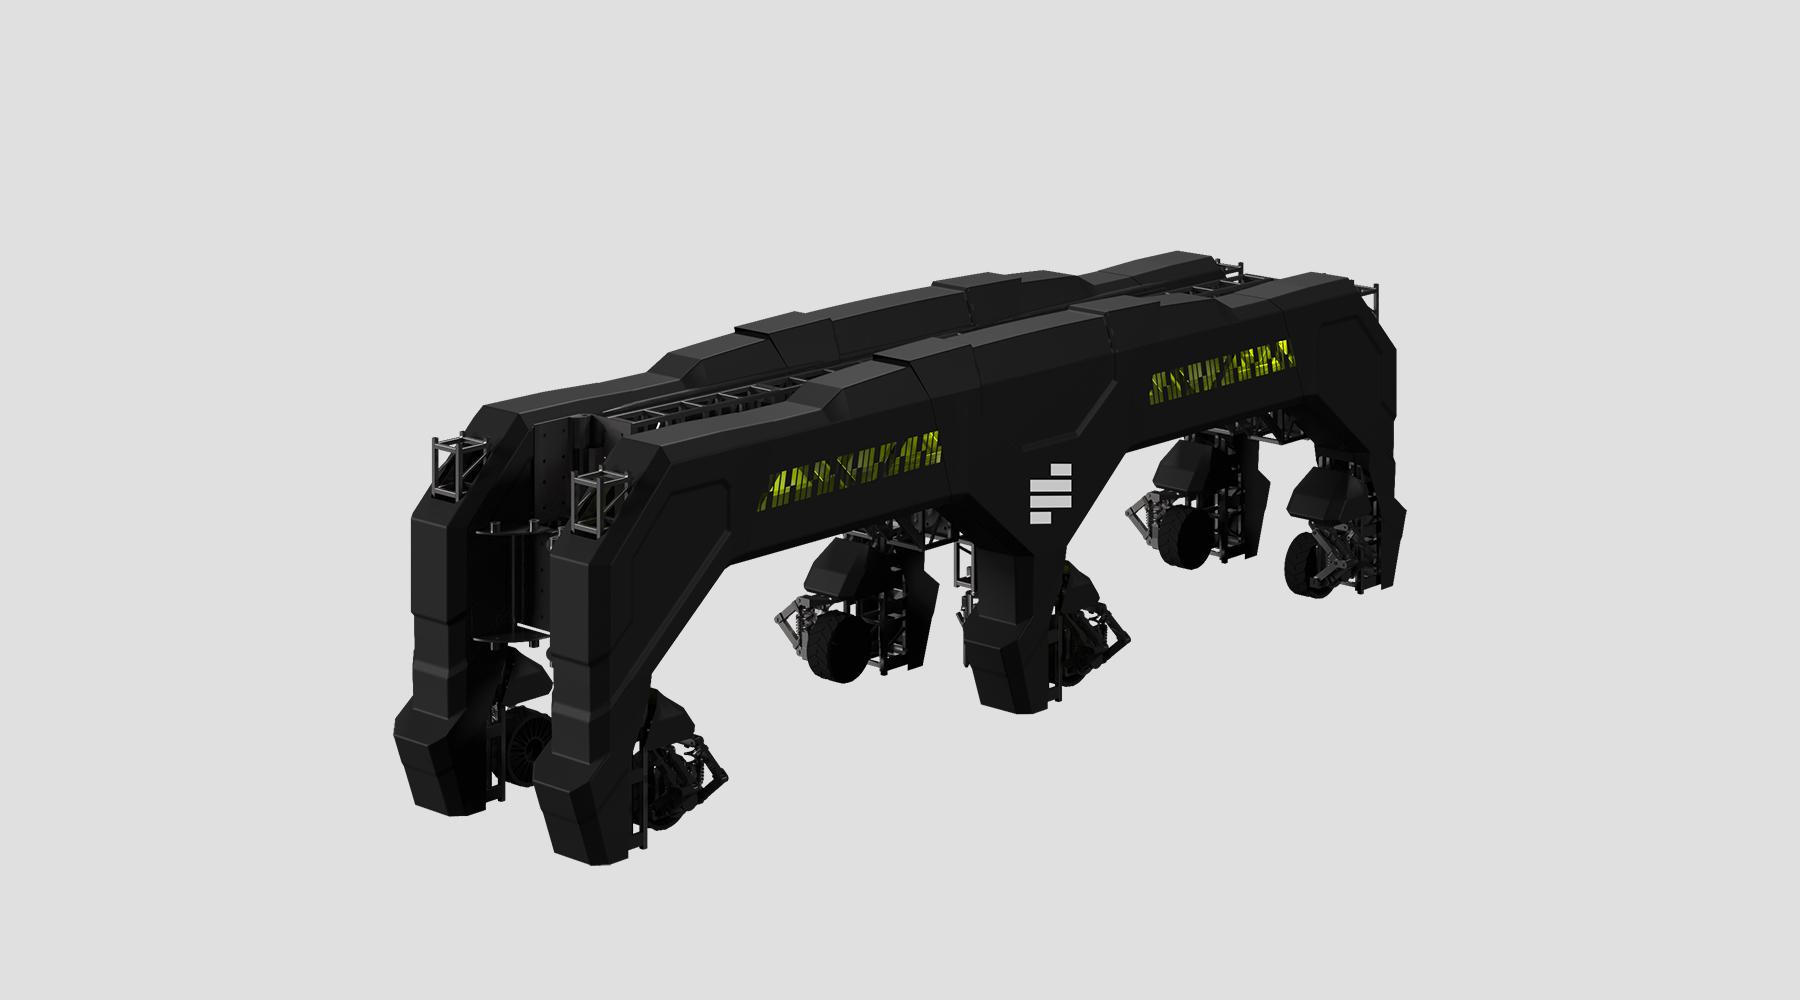 3D Printer Goliath